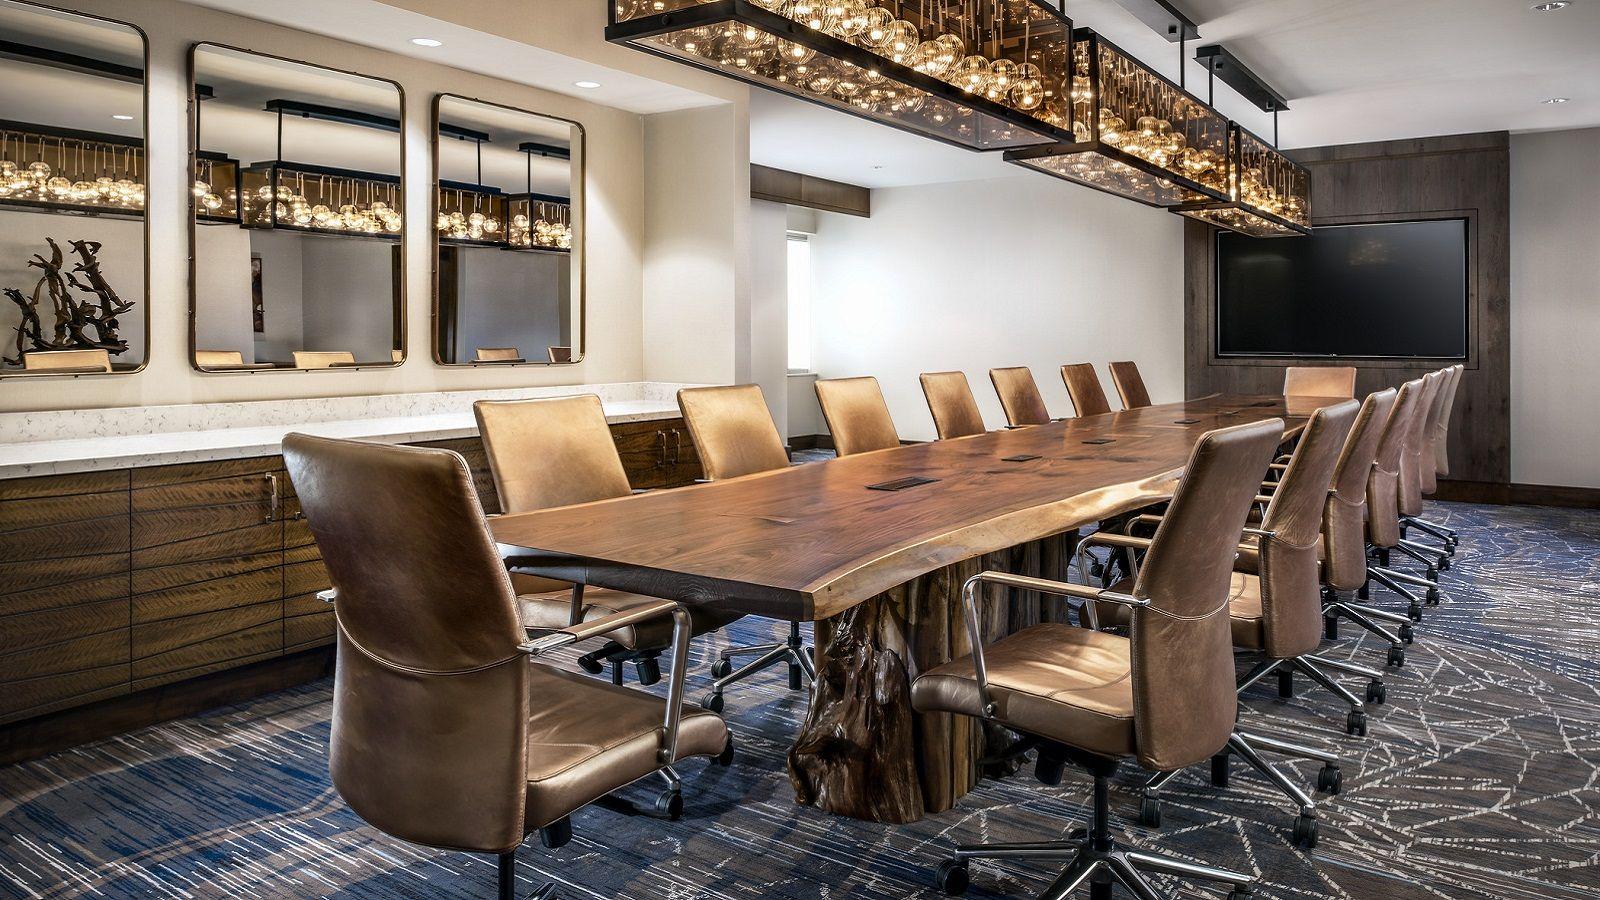 wes4247mf-204744-Westin-Executive-Boardroom.jpg